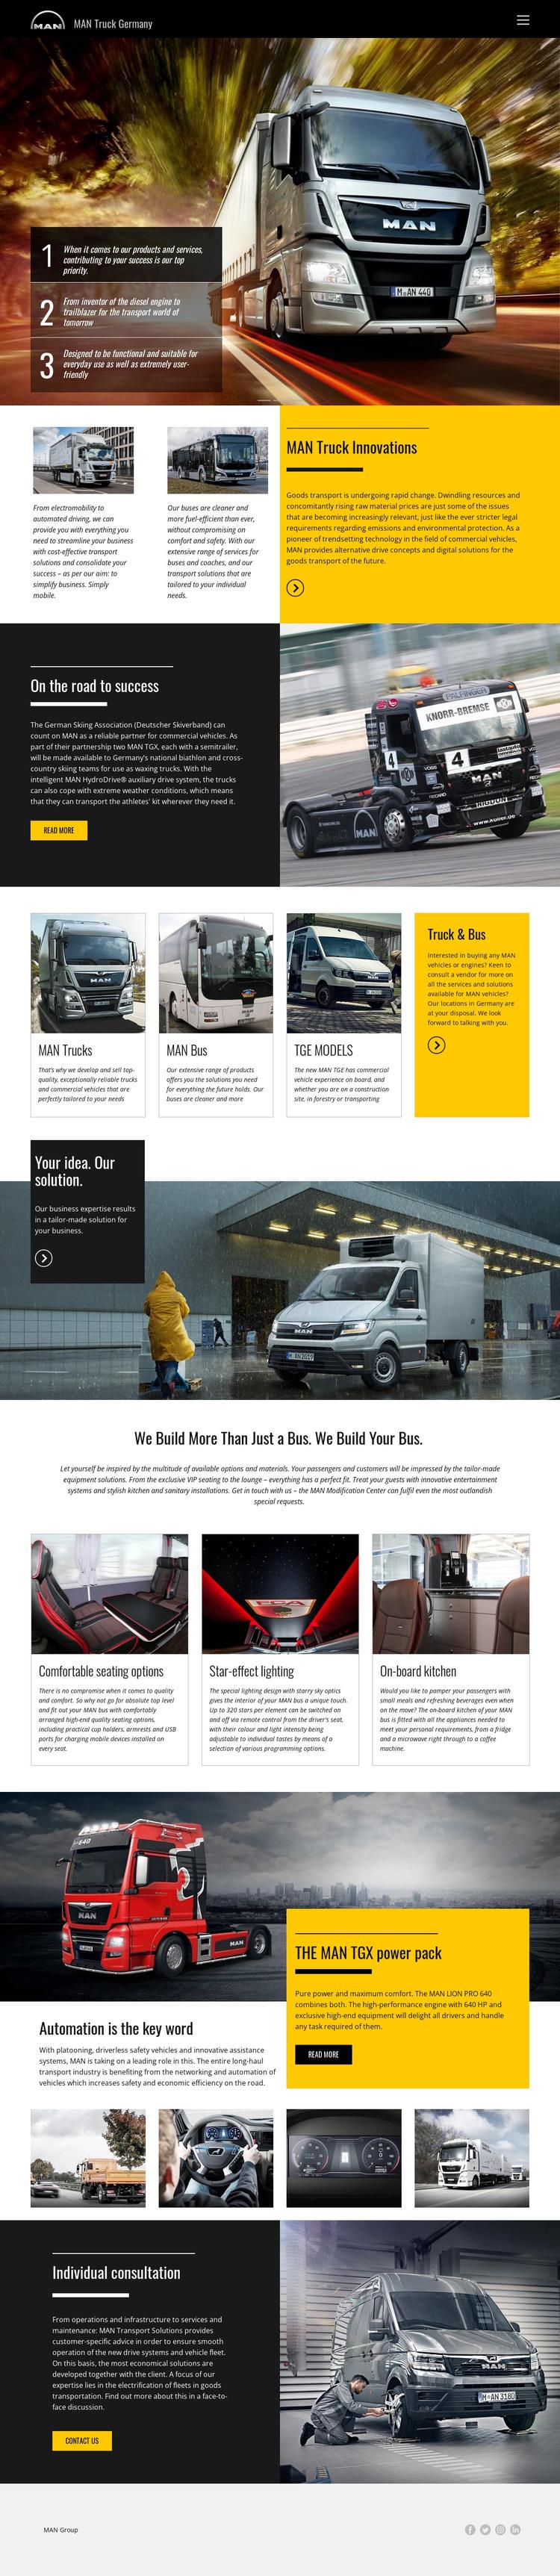 Man trucks for transportation HTML Template